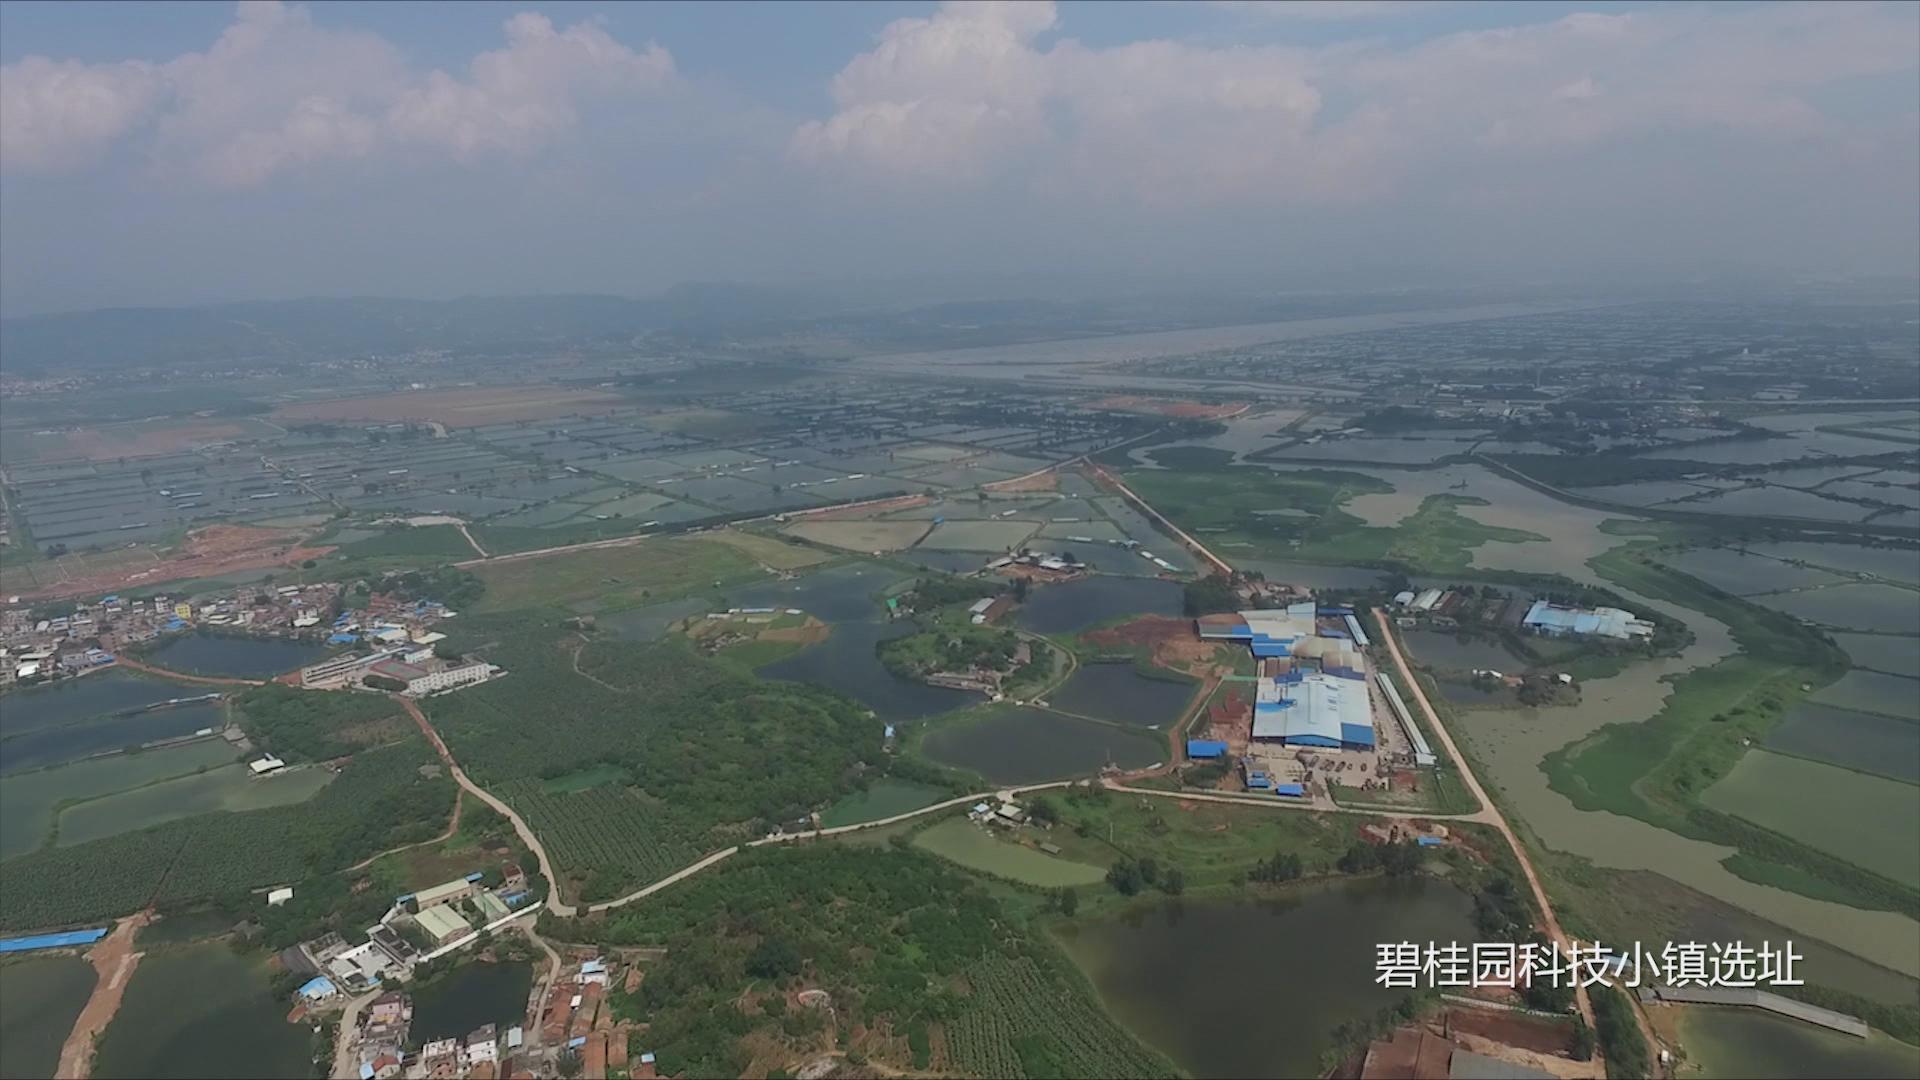 JTT-T60系列   碧桂园科技小镇选址航拍